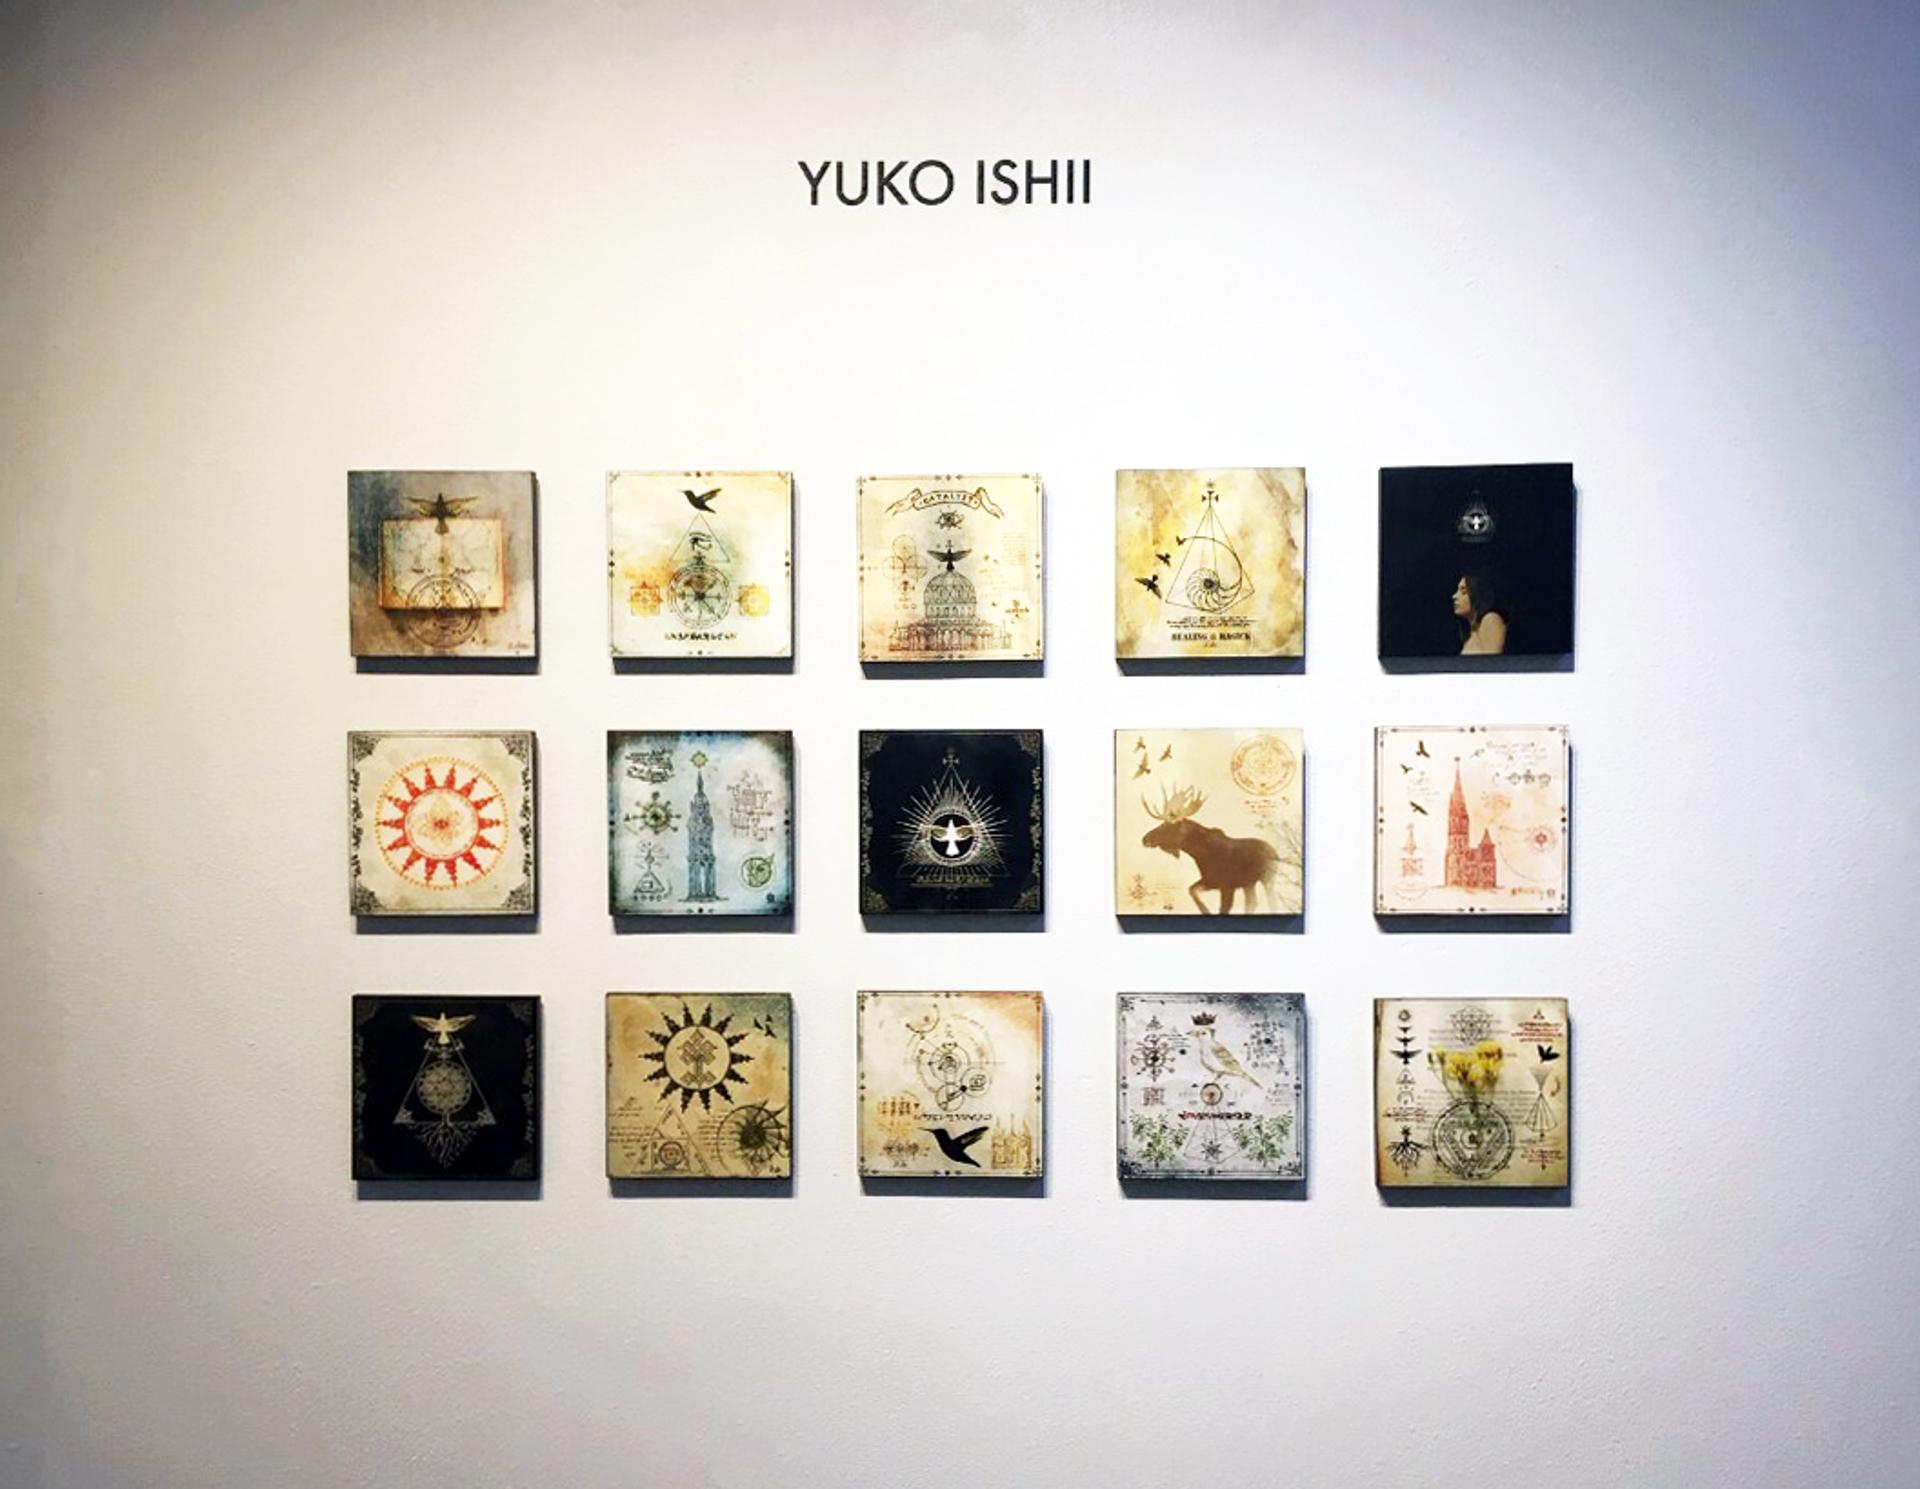 Requiem by Yuko Ishii